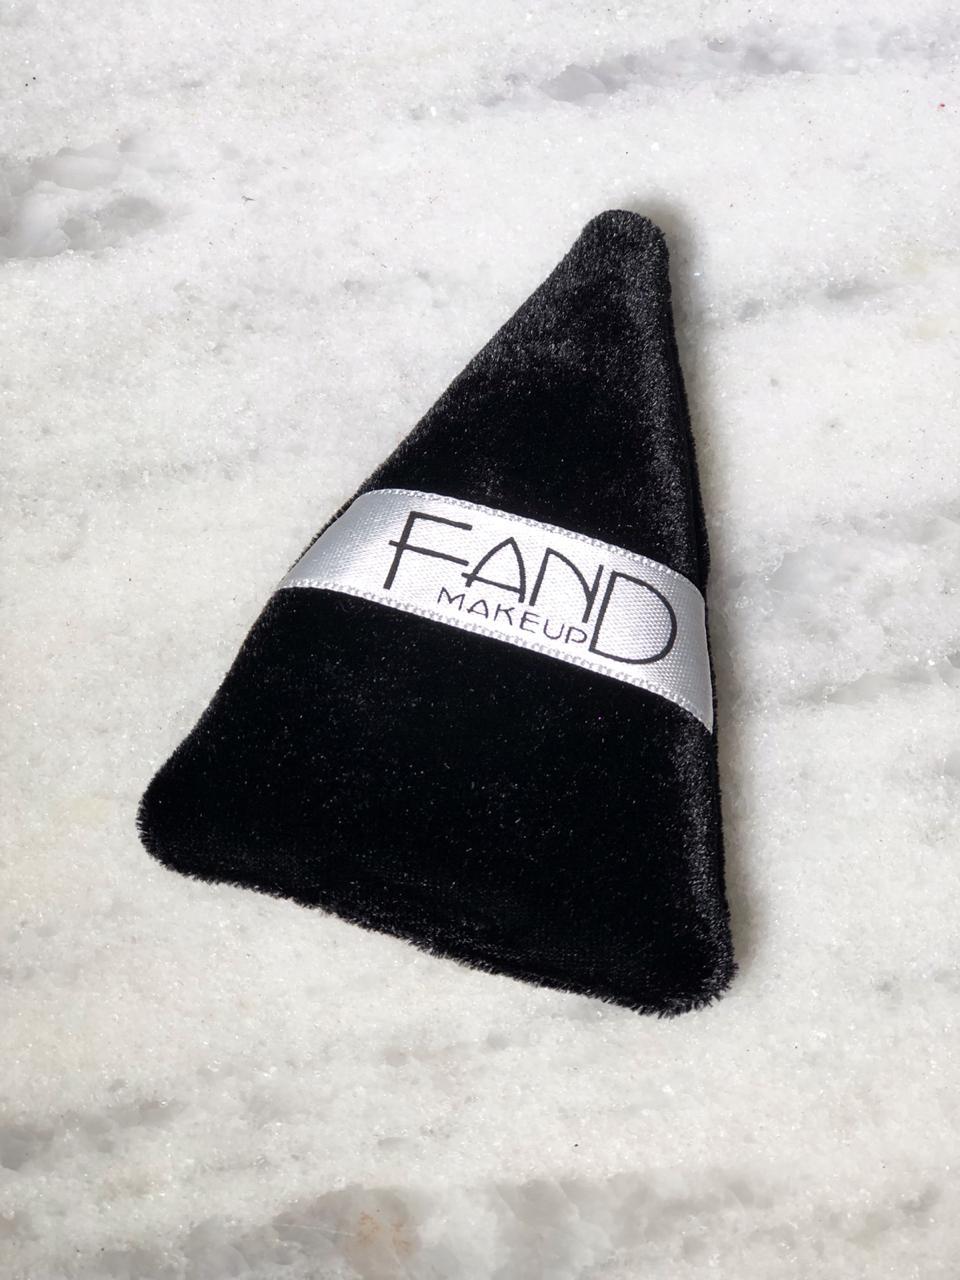 Esponja triangular - Fand